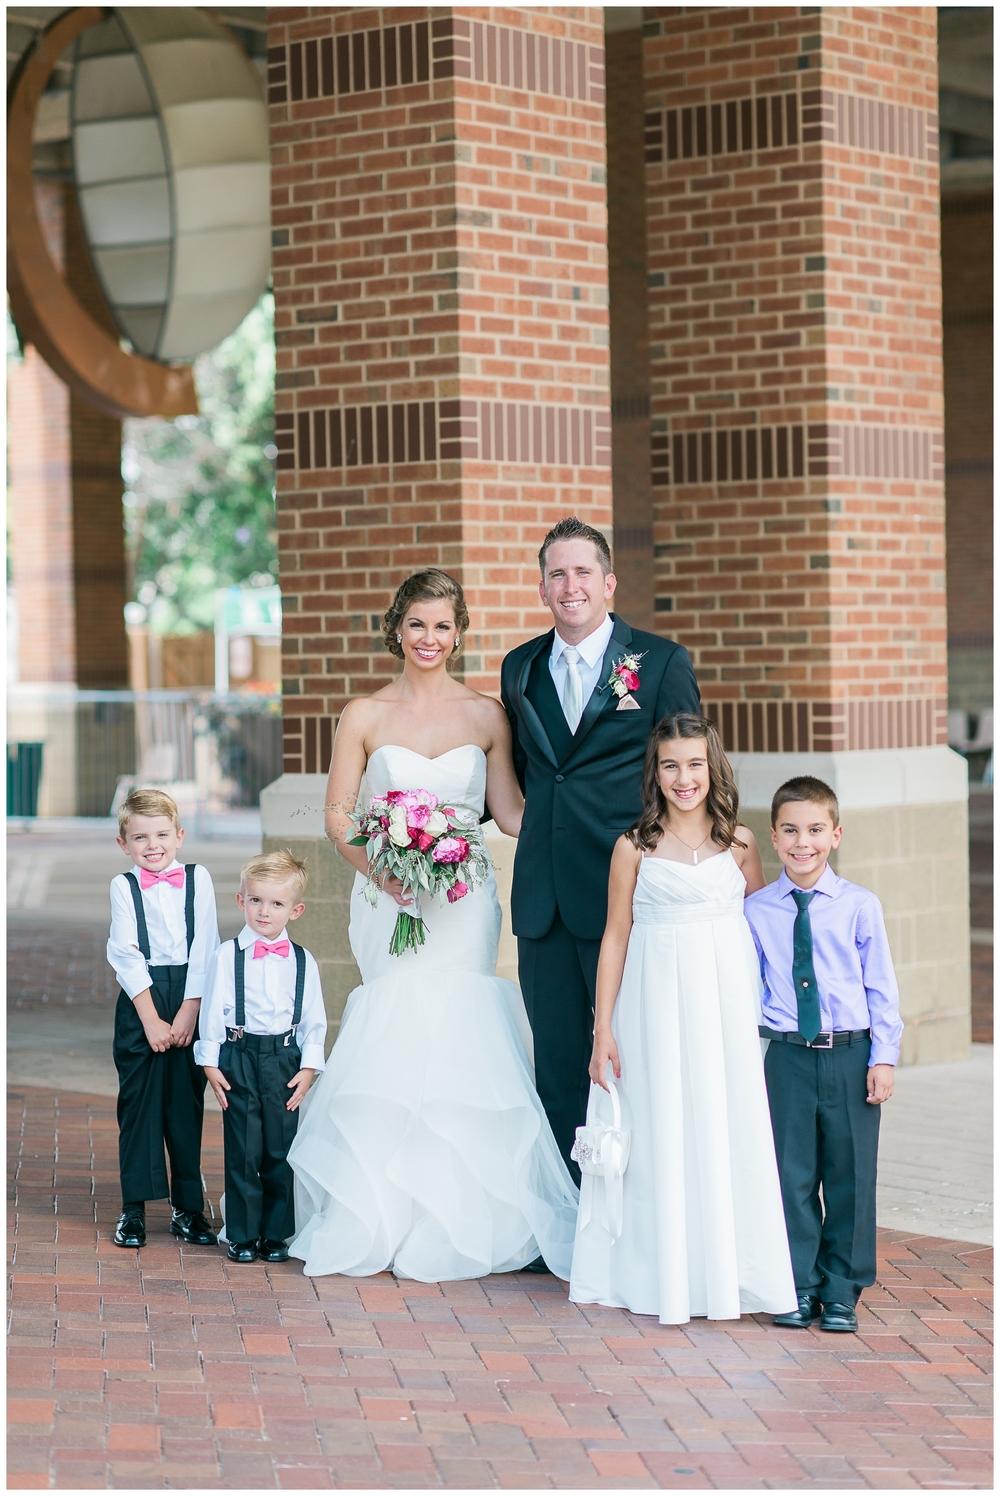 Rebecca_Bridges_Photography_Indianapolis_Wedding_Photographer_5070.jpg